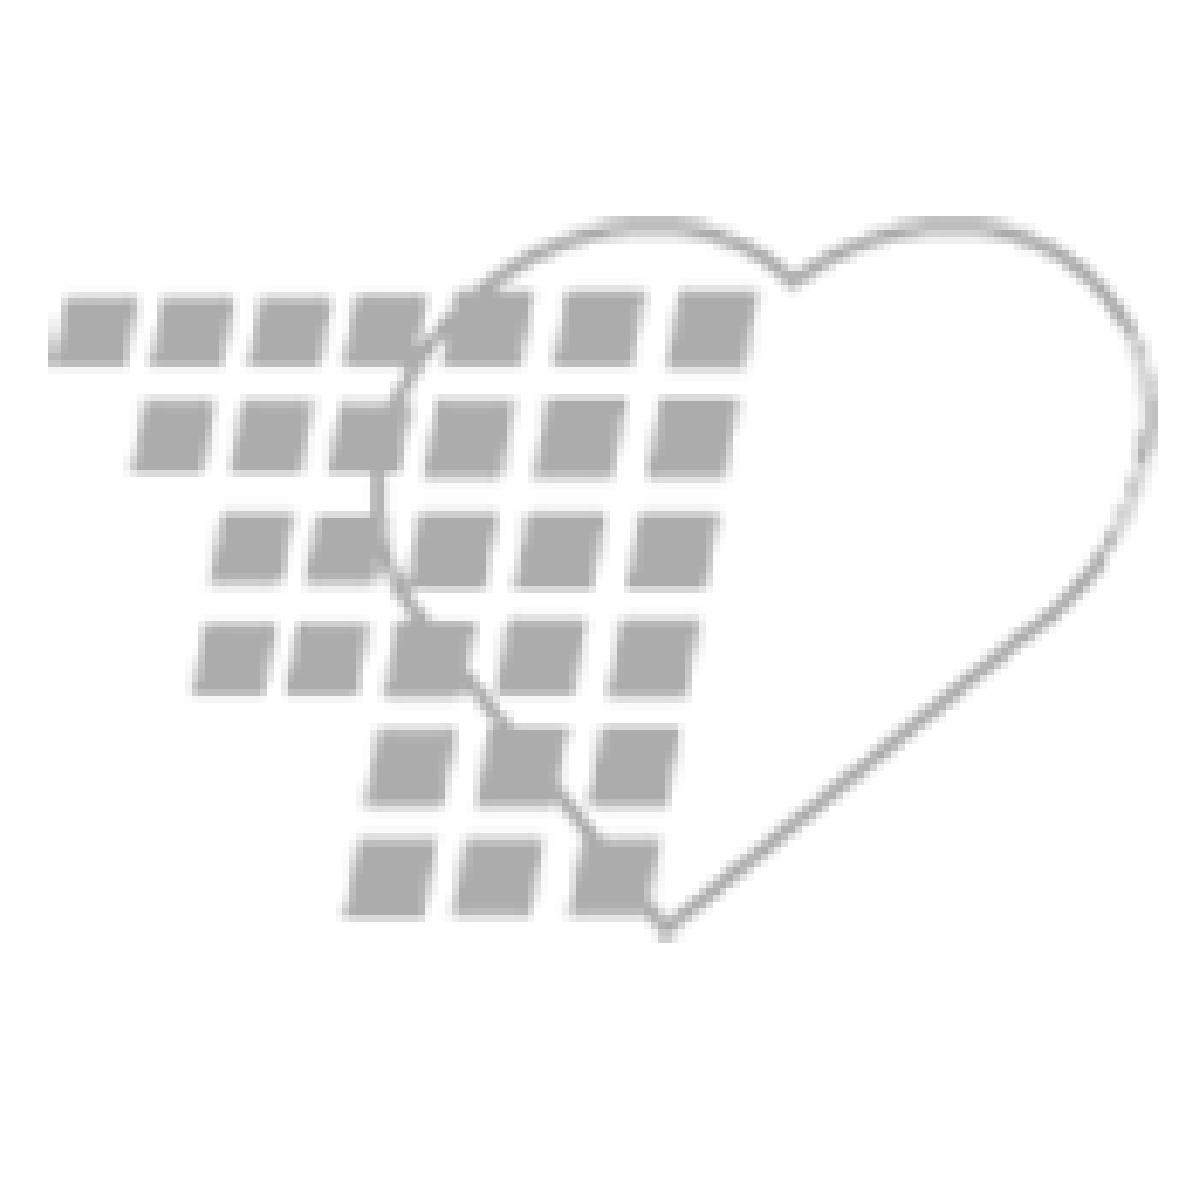 06-21-708 Scalp Vein Set BSV/Butterfly Small Vein Infusion